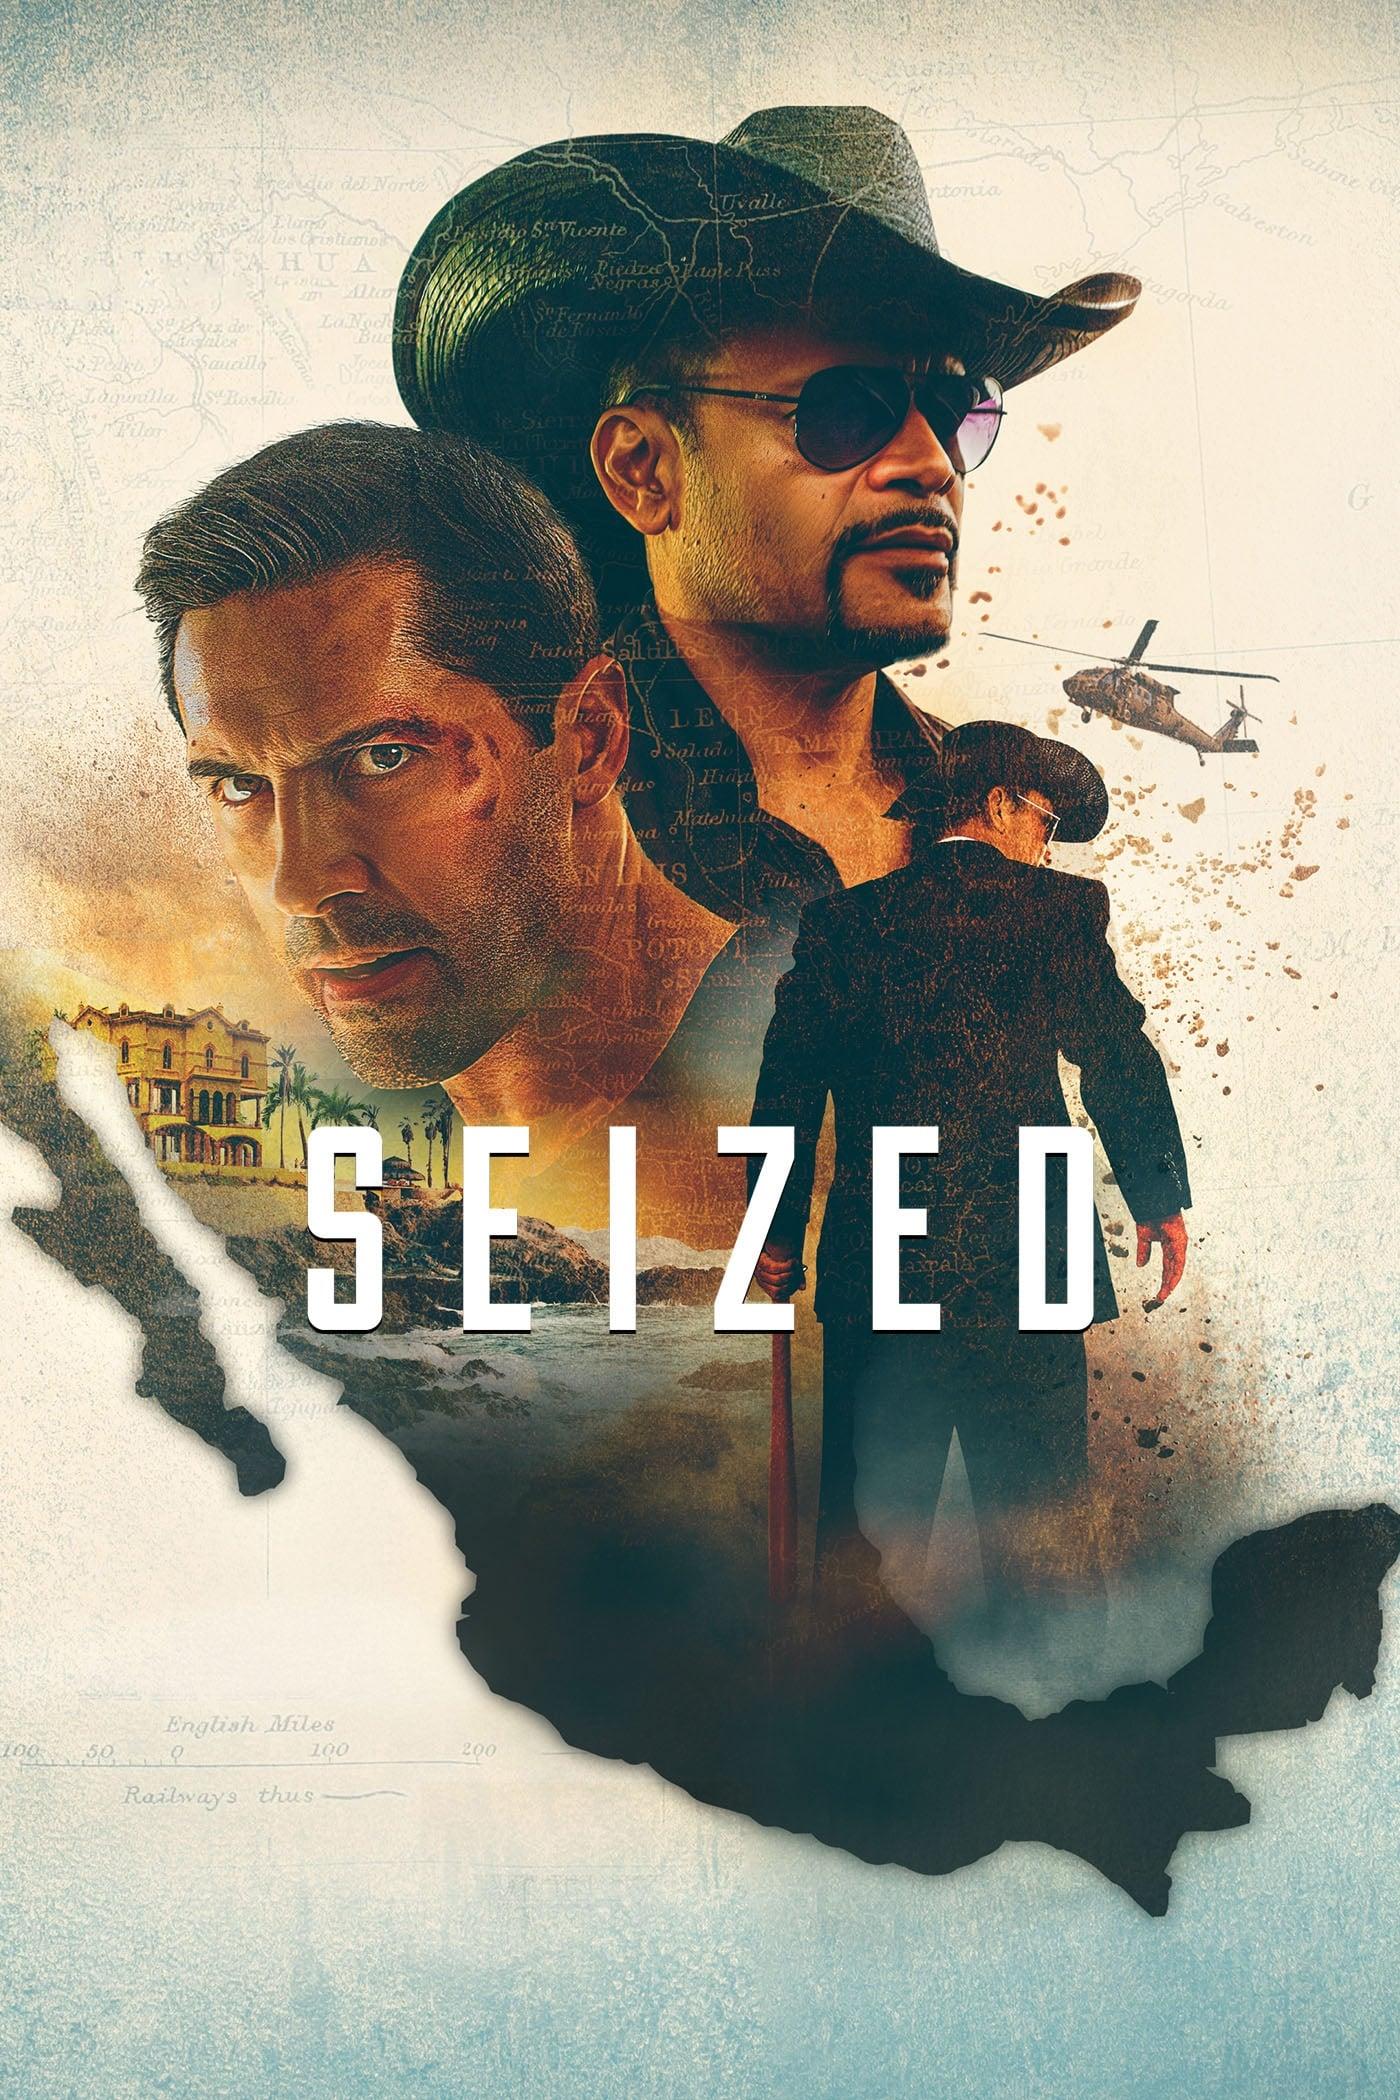 Seized